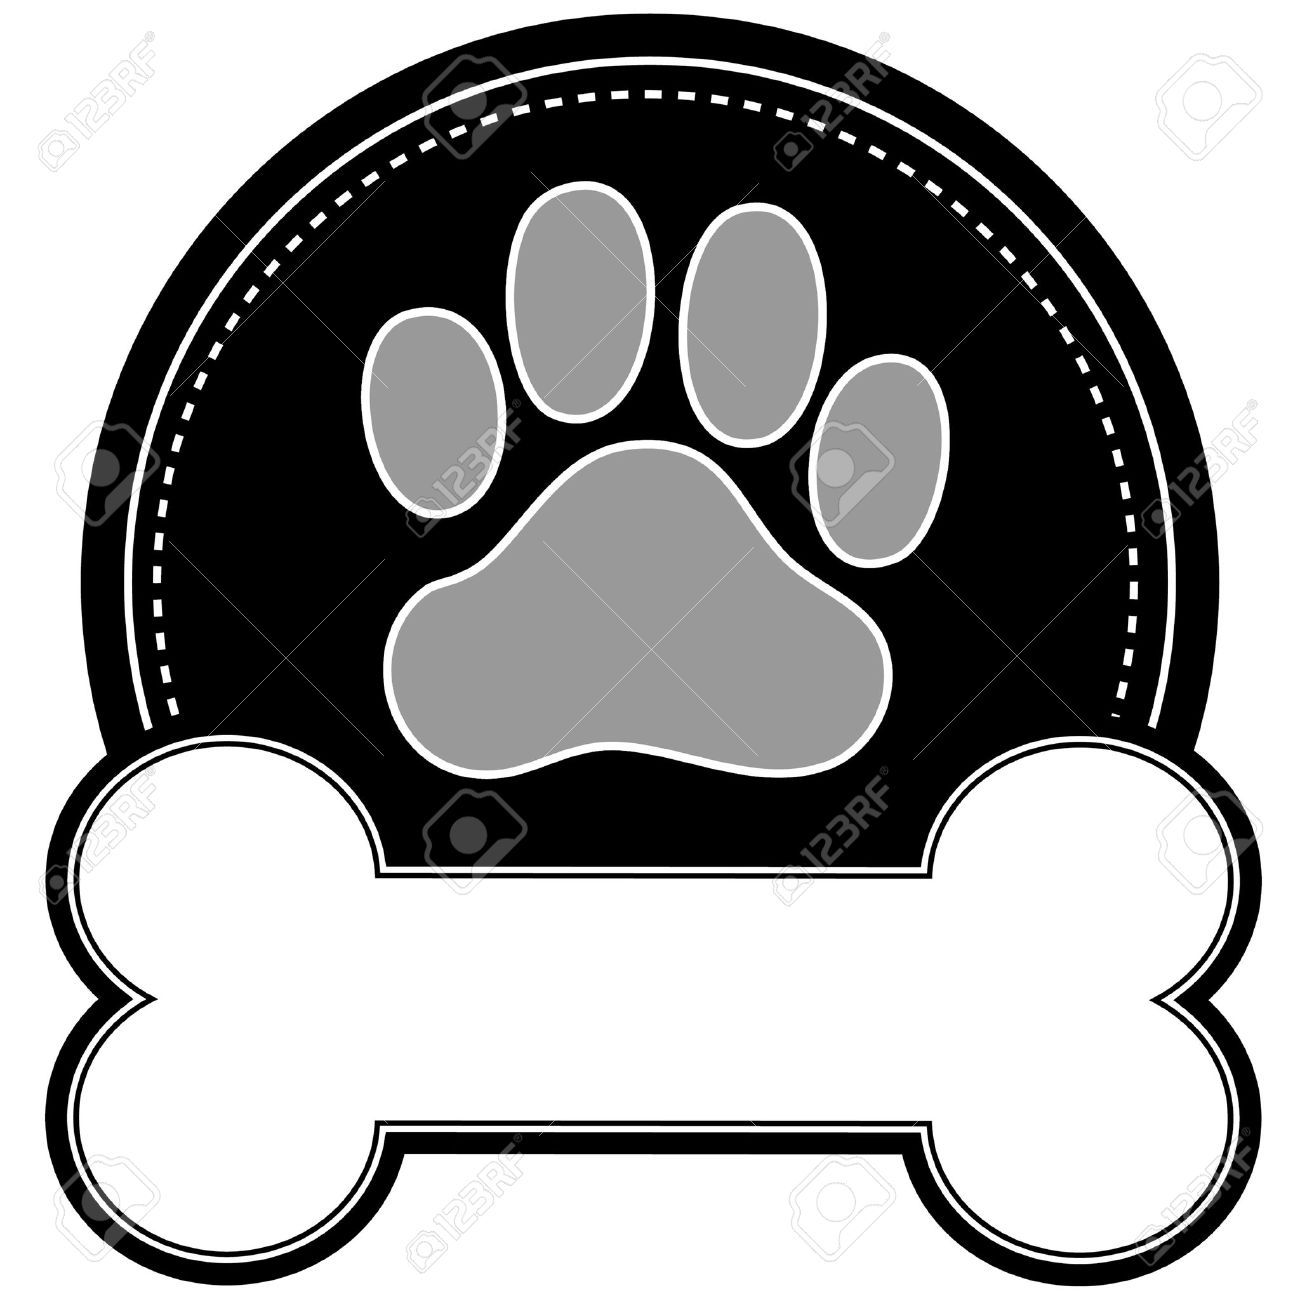 siluetas de perros para imprimir - Buscar con Google | siluetas ...